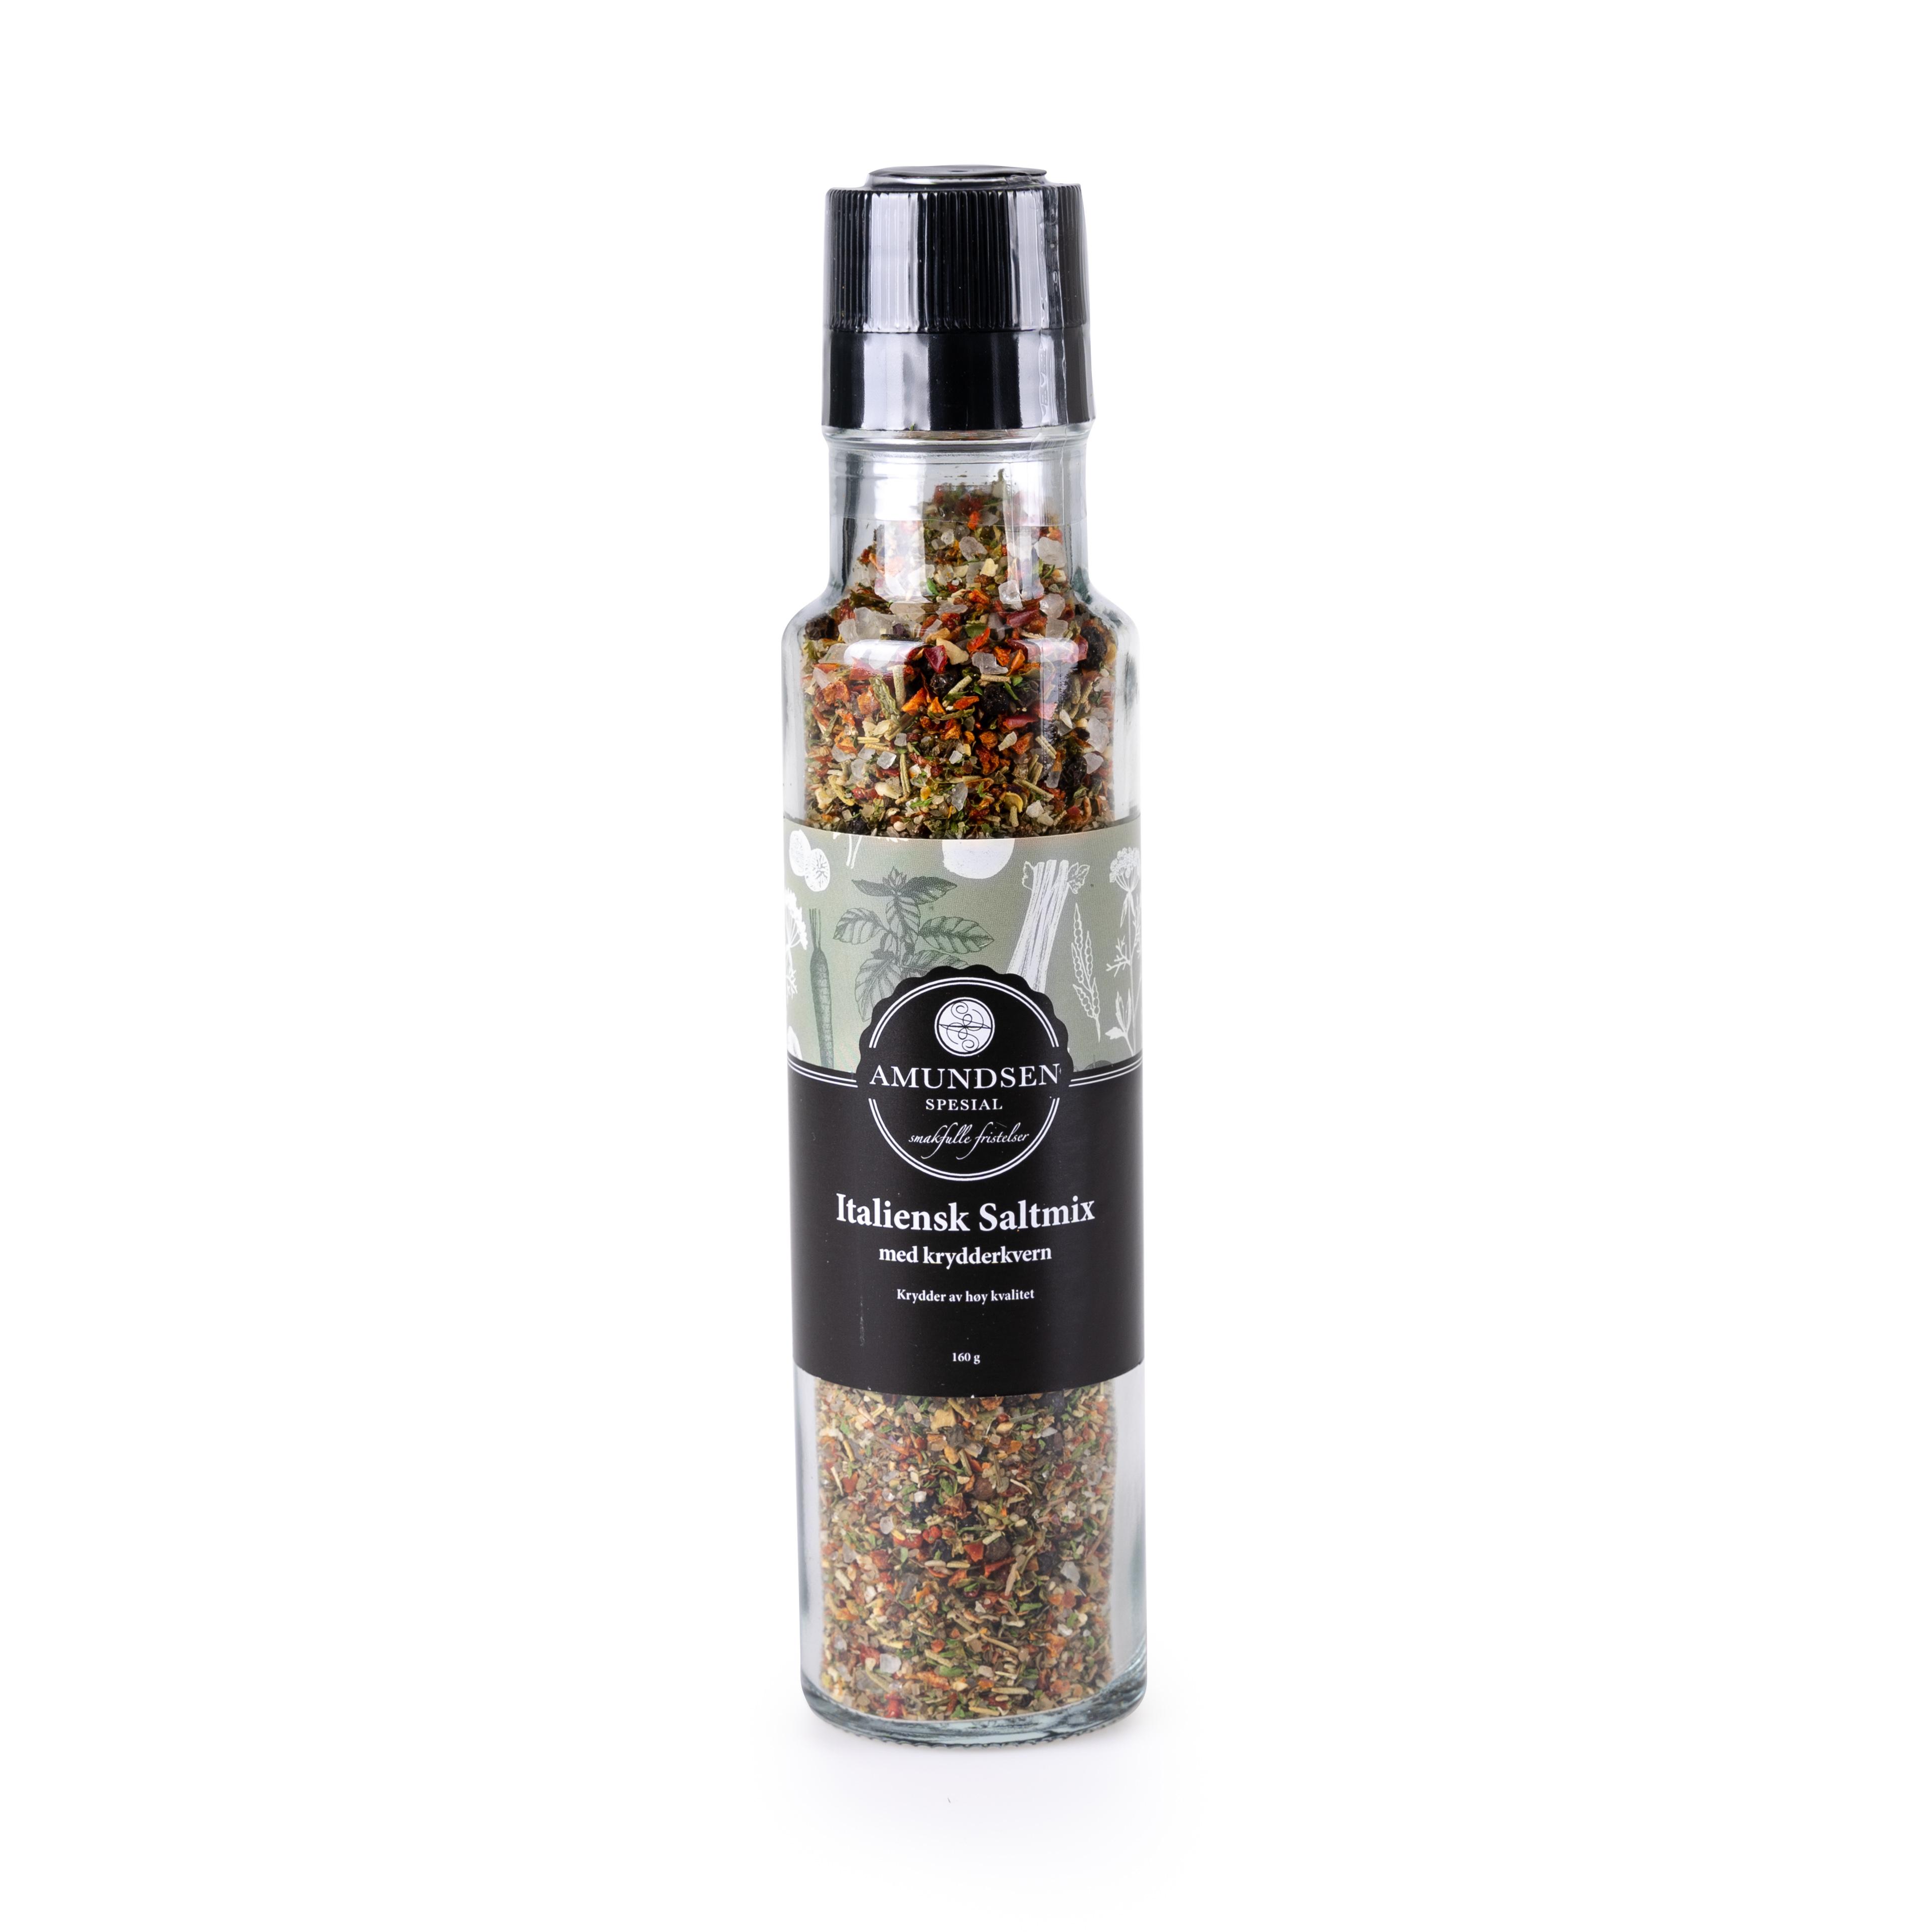 Italiensk Saltmix Krydderkvern